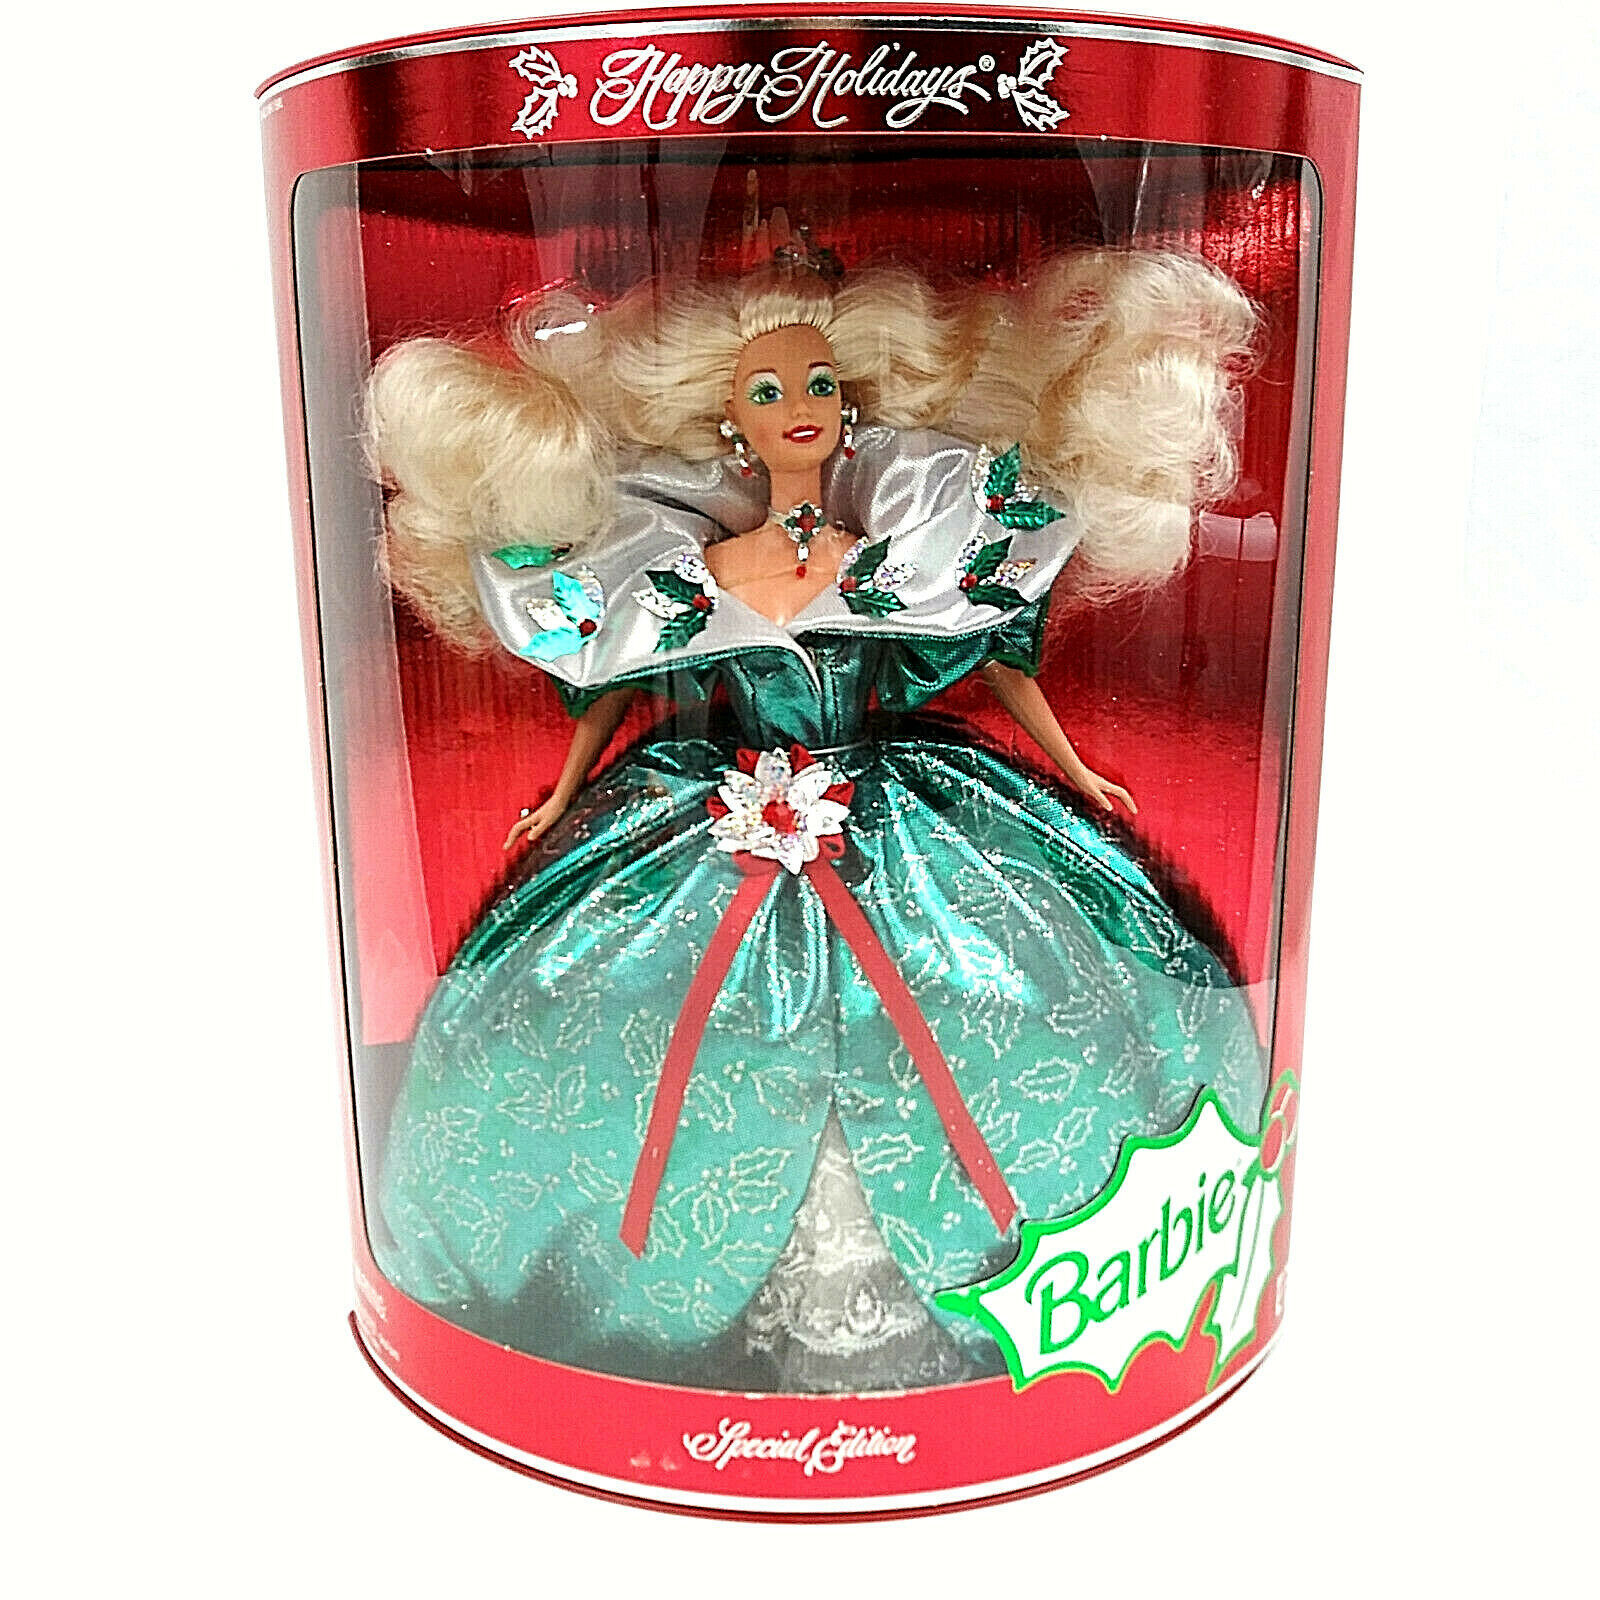 MIB Lot of 4 Vintage 1995 Hallmark Barbie Special Edition Sweet Valentine